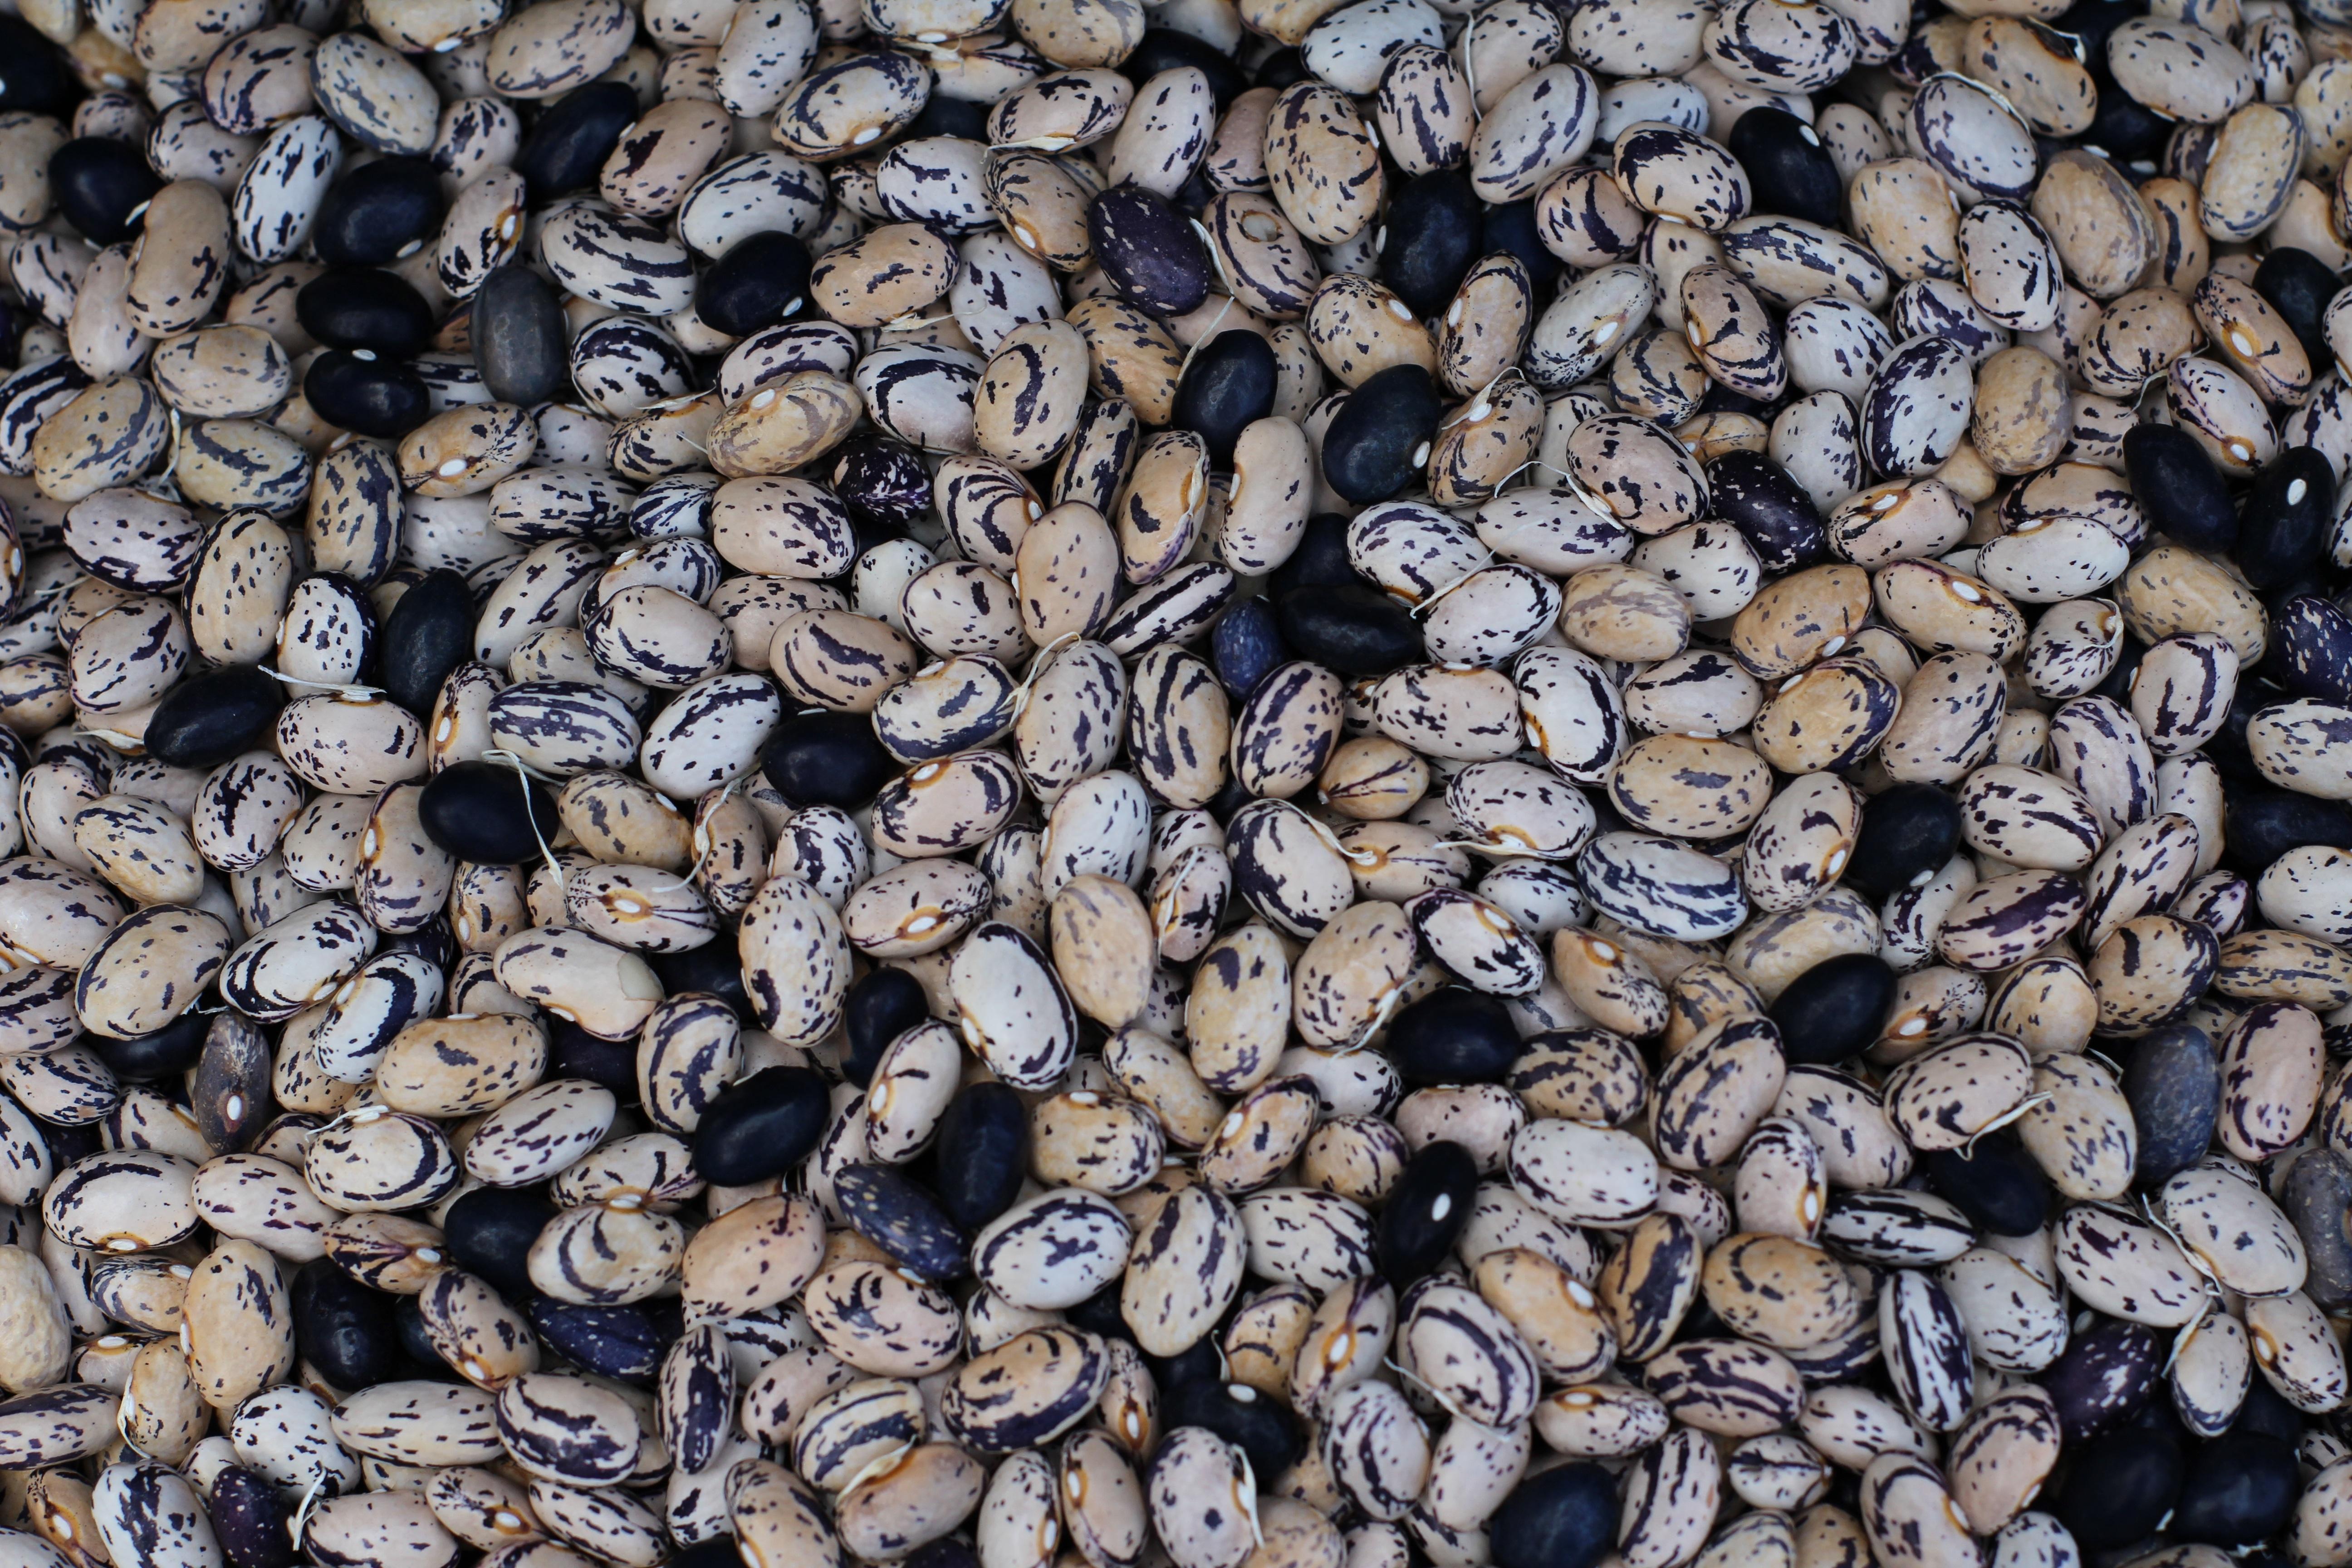 Rock Wood White Texture Flower Food Produce Pebble Soil Black Material Rubble Background Numbers Gravel Bob